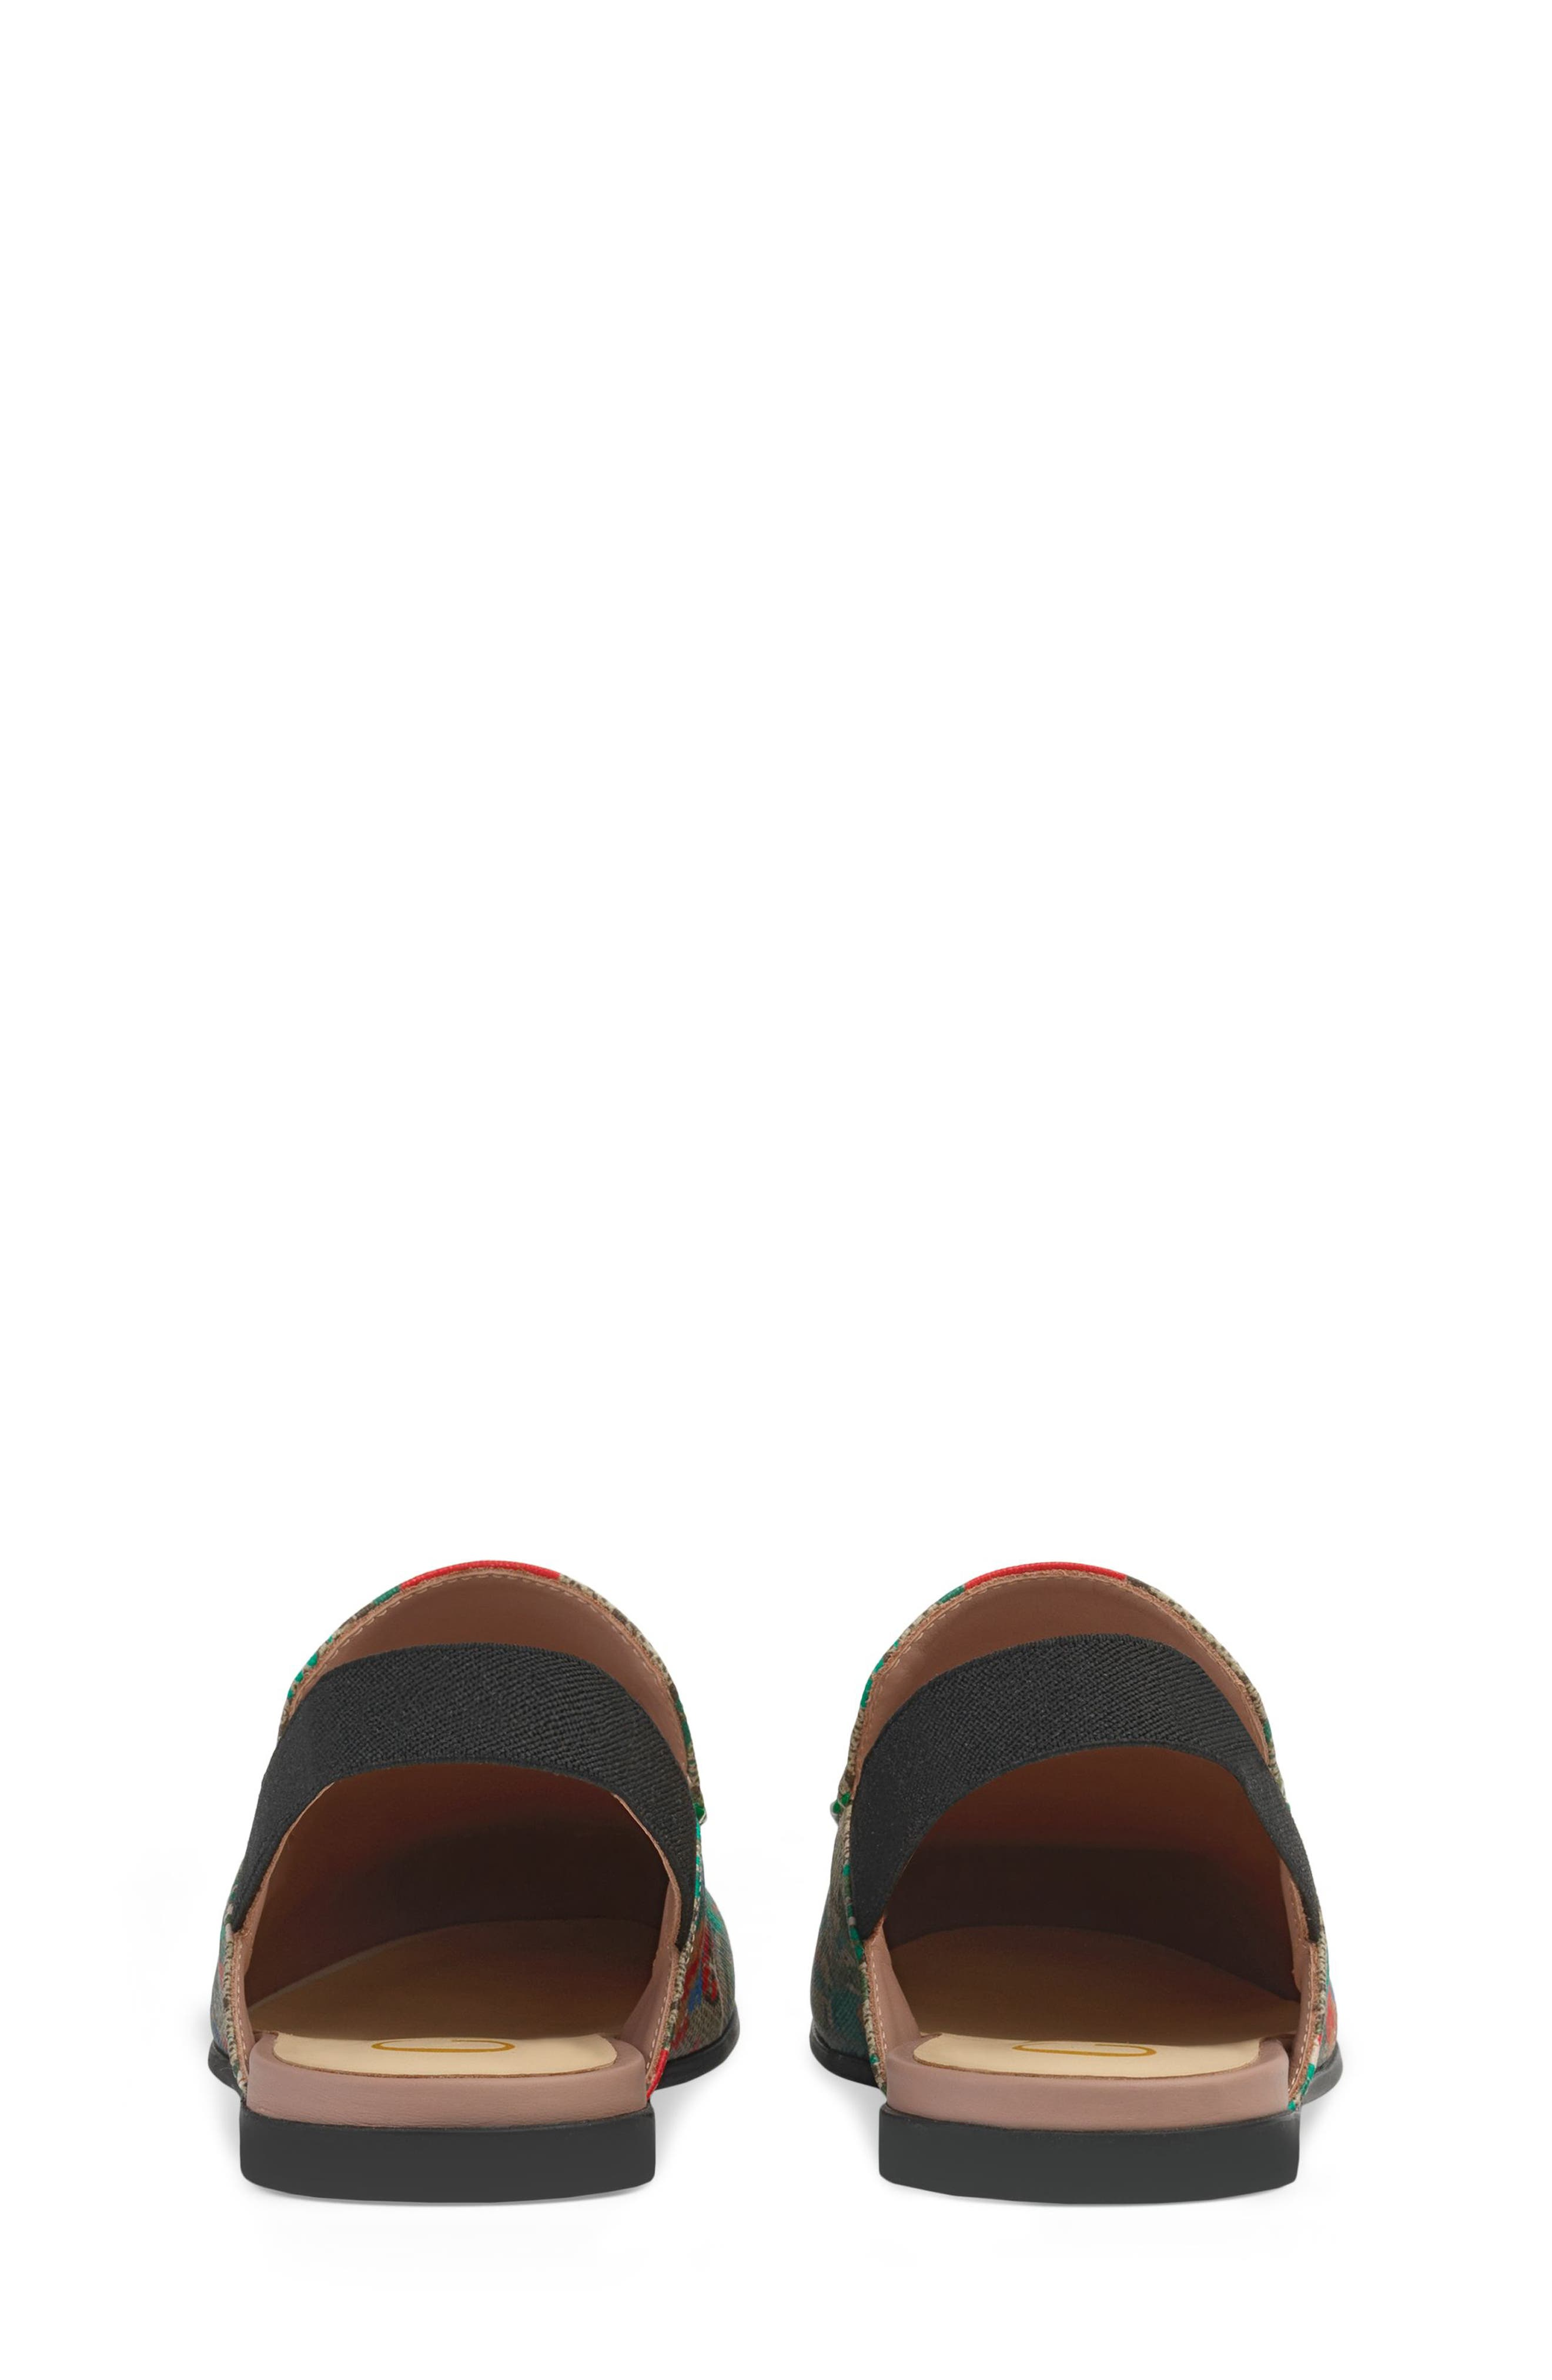 Princetown Slingback Loafer Mule,                             Alternate thumbnail 2, color,                             BEIGE EBONY MULTI